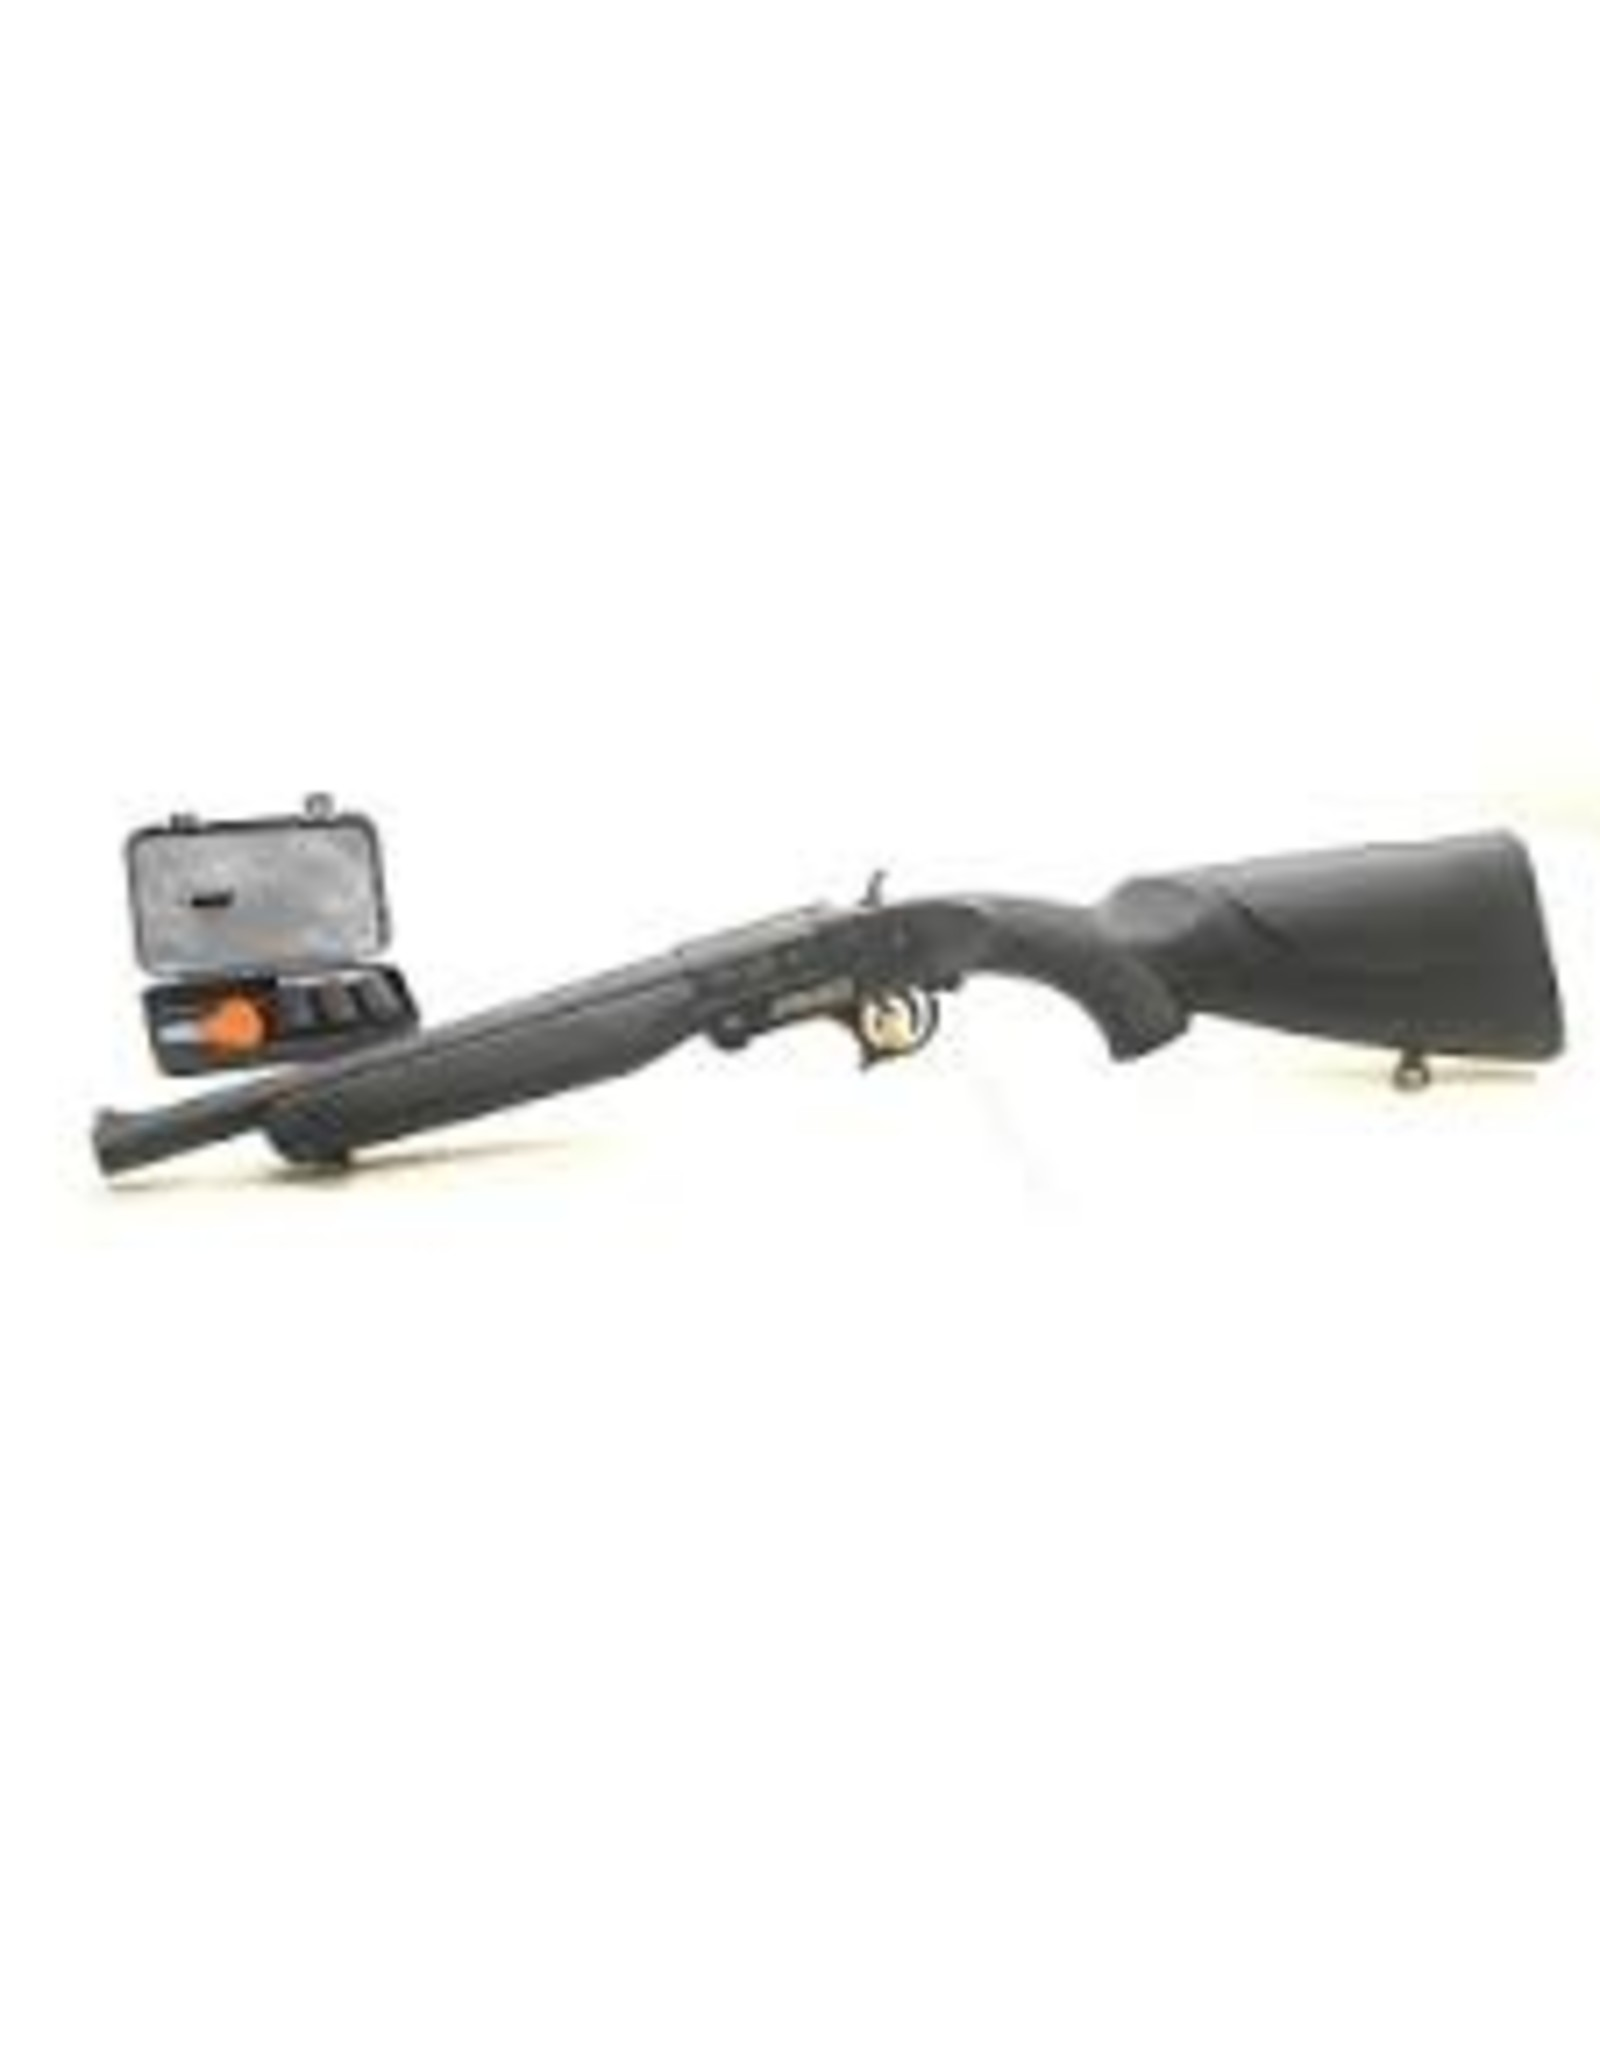 "Armed Armed Single Shot Shotgun Sash 12GA 16"" Barrel"